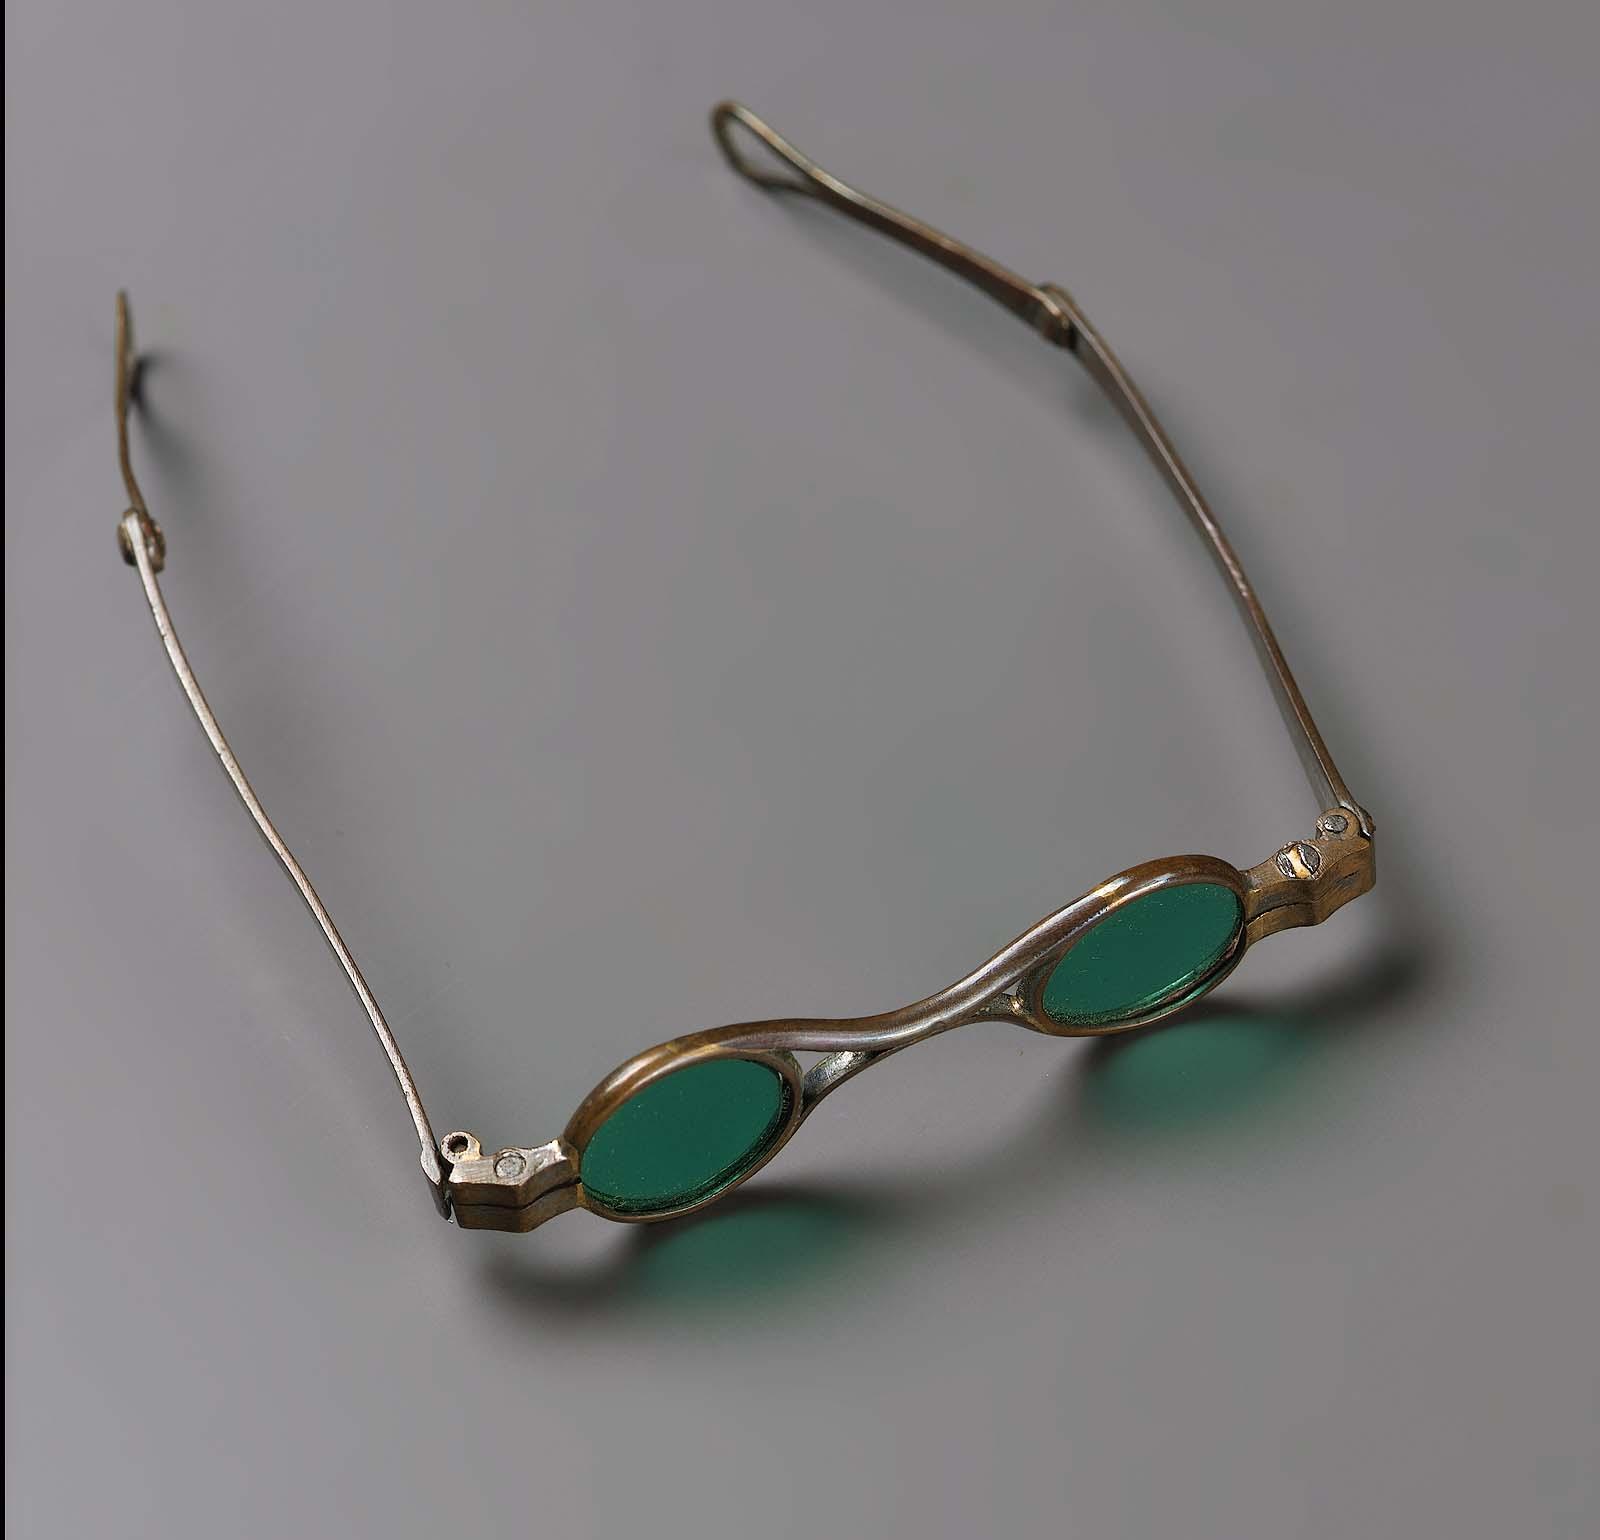 Miniature Eyeglass Case With Eyeglasses Eyeglasses Museum Of Fine Arts Boston